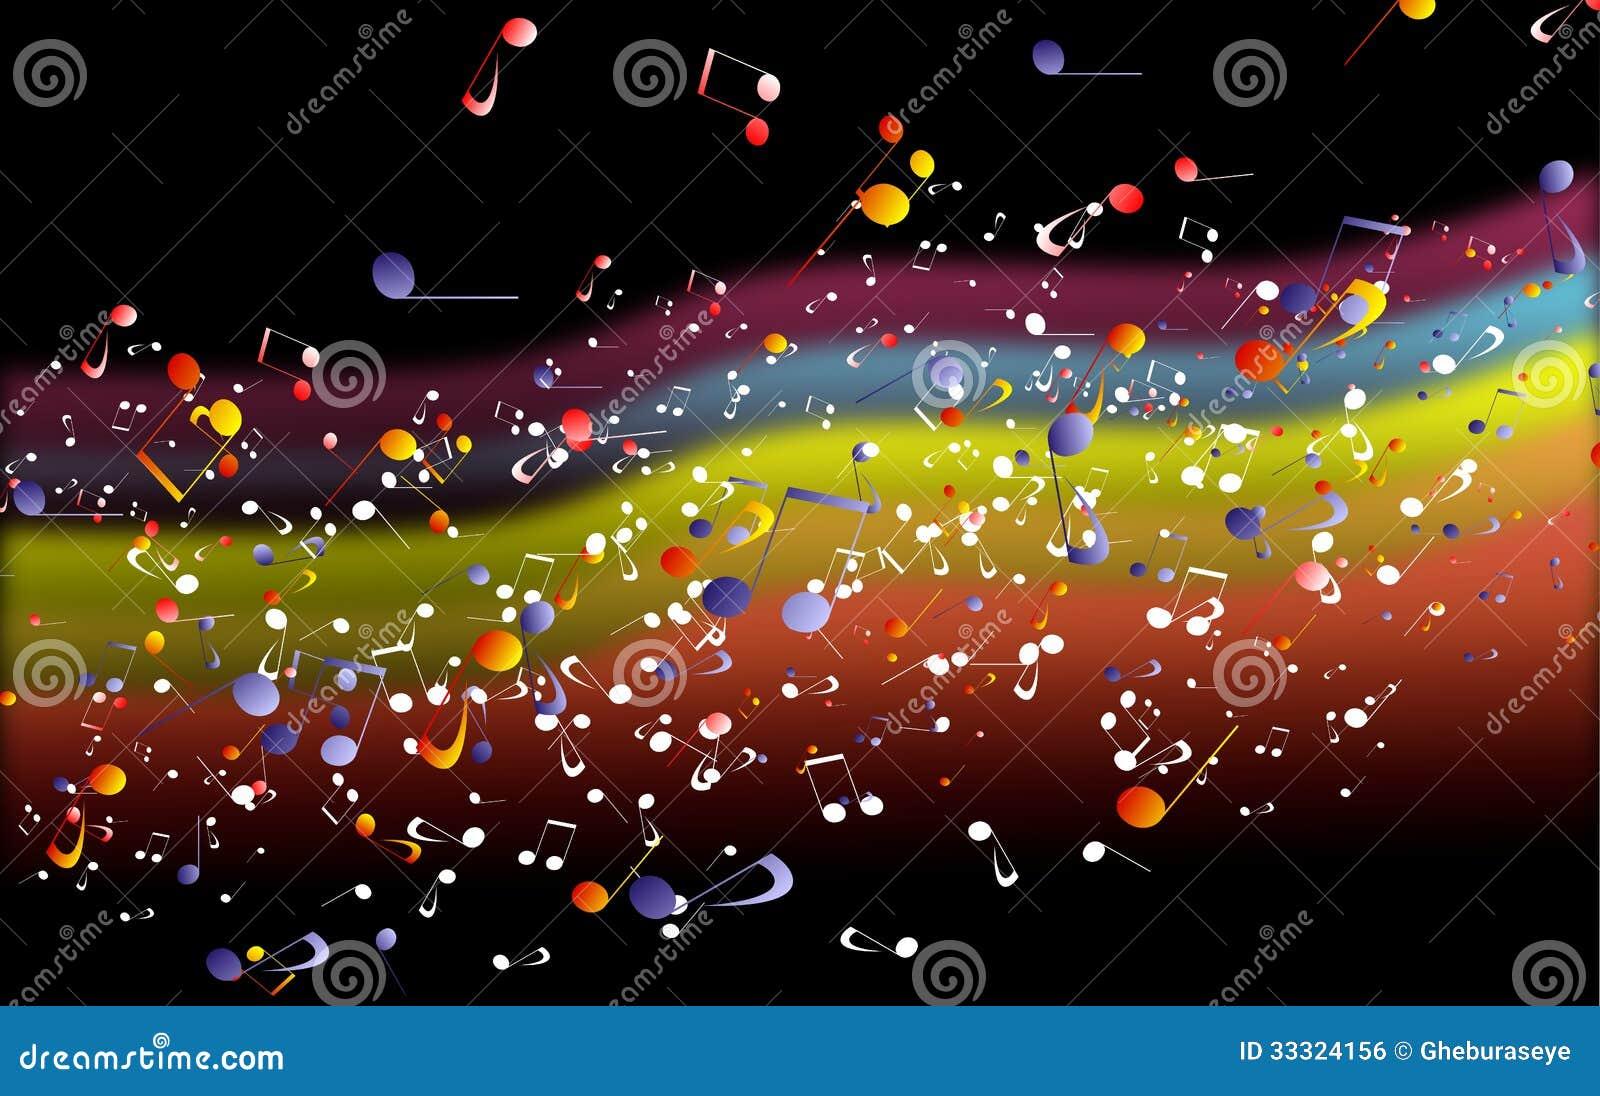 Musical Background Royalty Free Stock Image - Image: 33324156